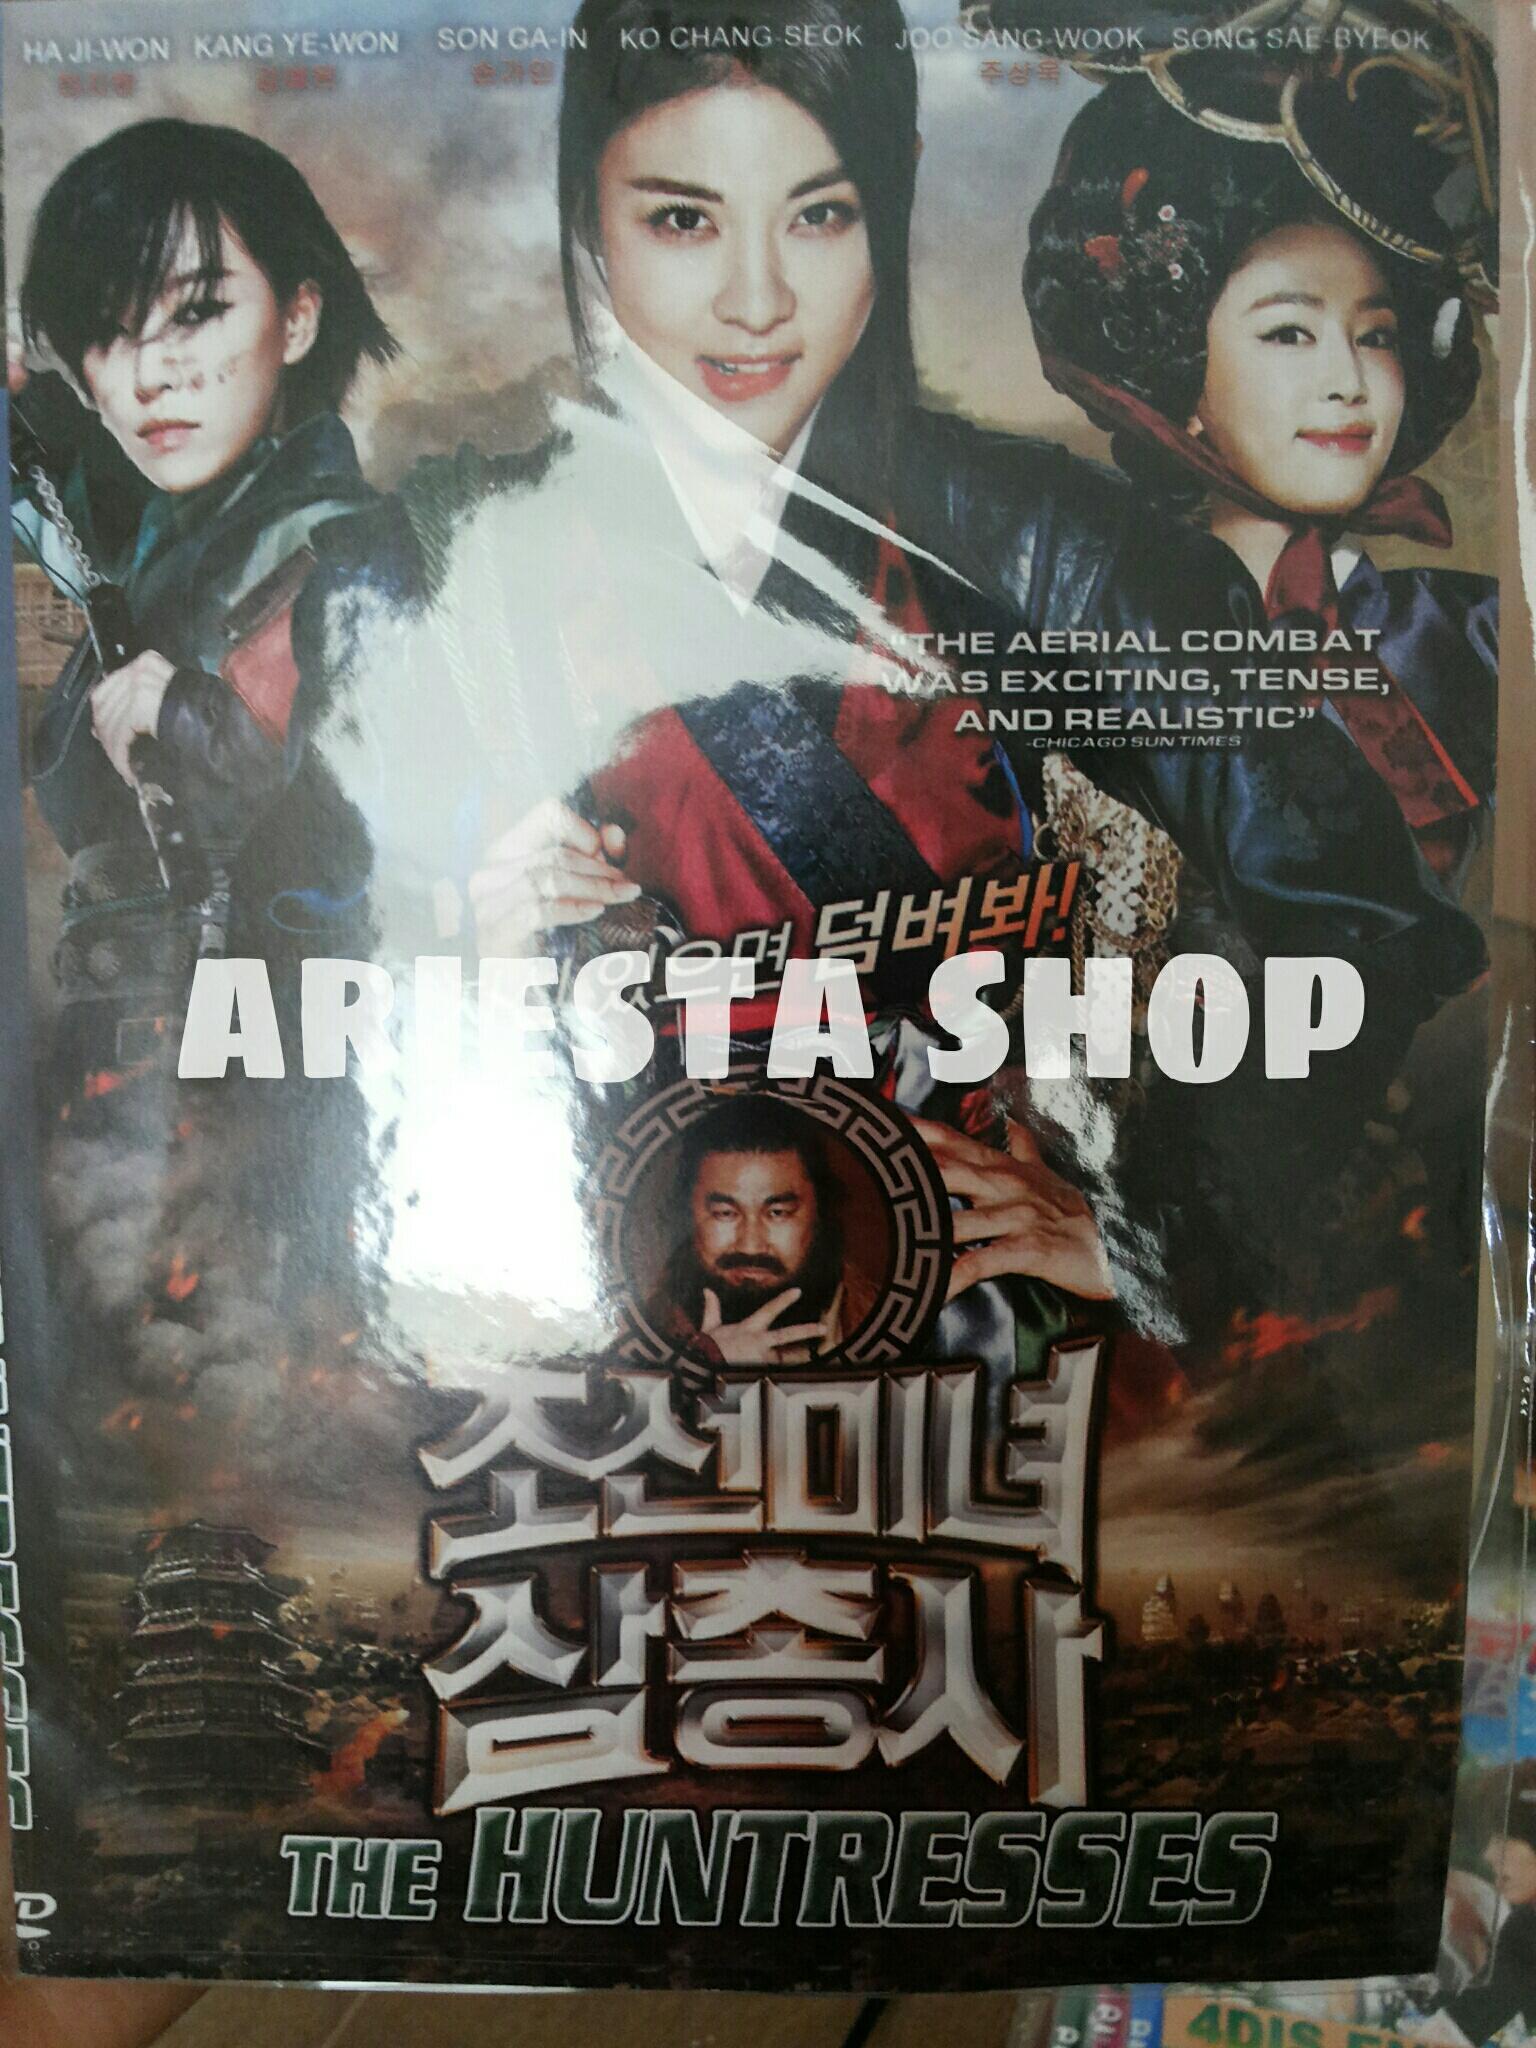 NEW DVD K-Movie 'The Huntresses'..Cast : Ha Ji Won,Kang Ye Won,Son Ga In..1 disc..6 ribu/disc.. http://t.co/n63clgi2KT